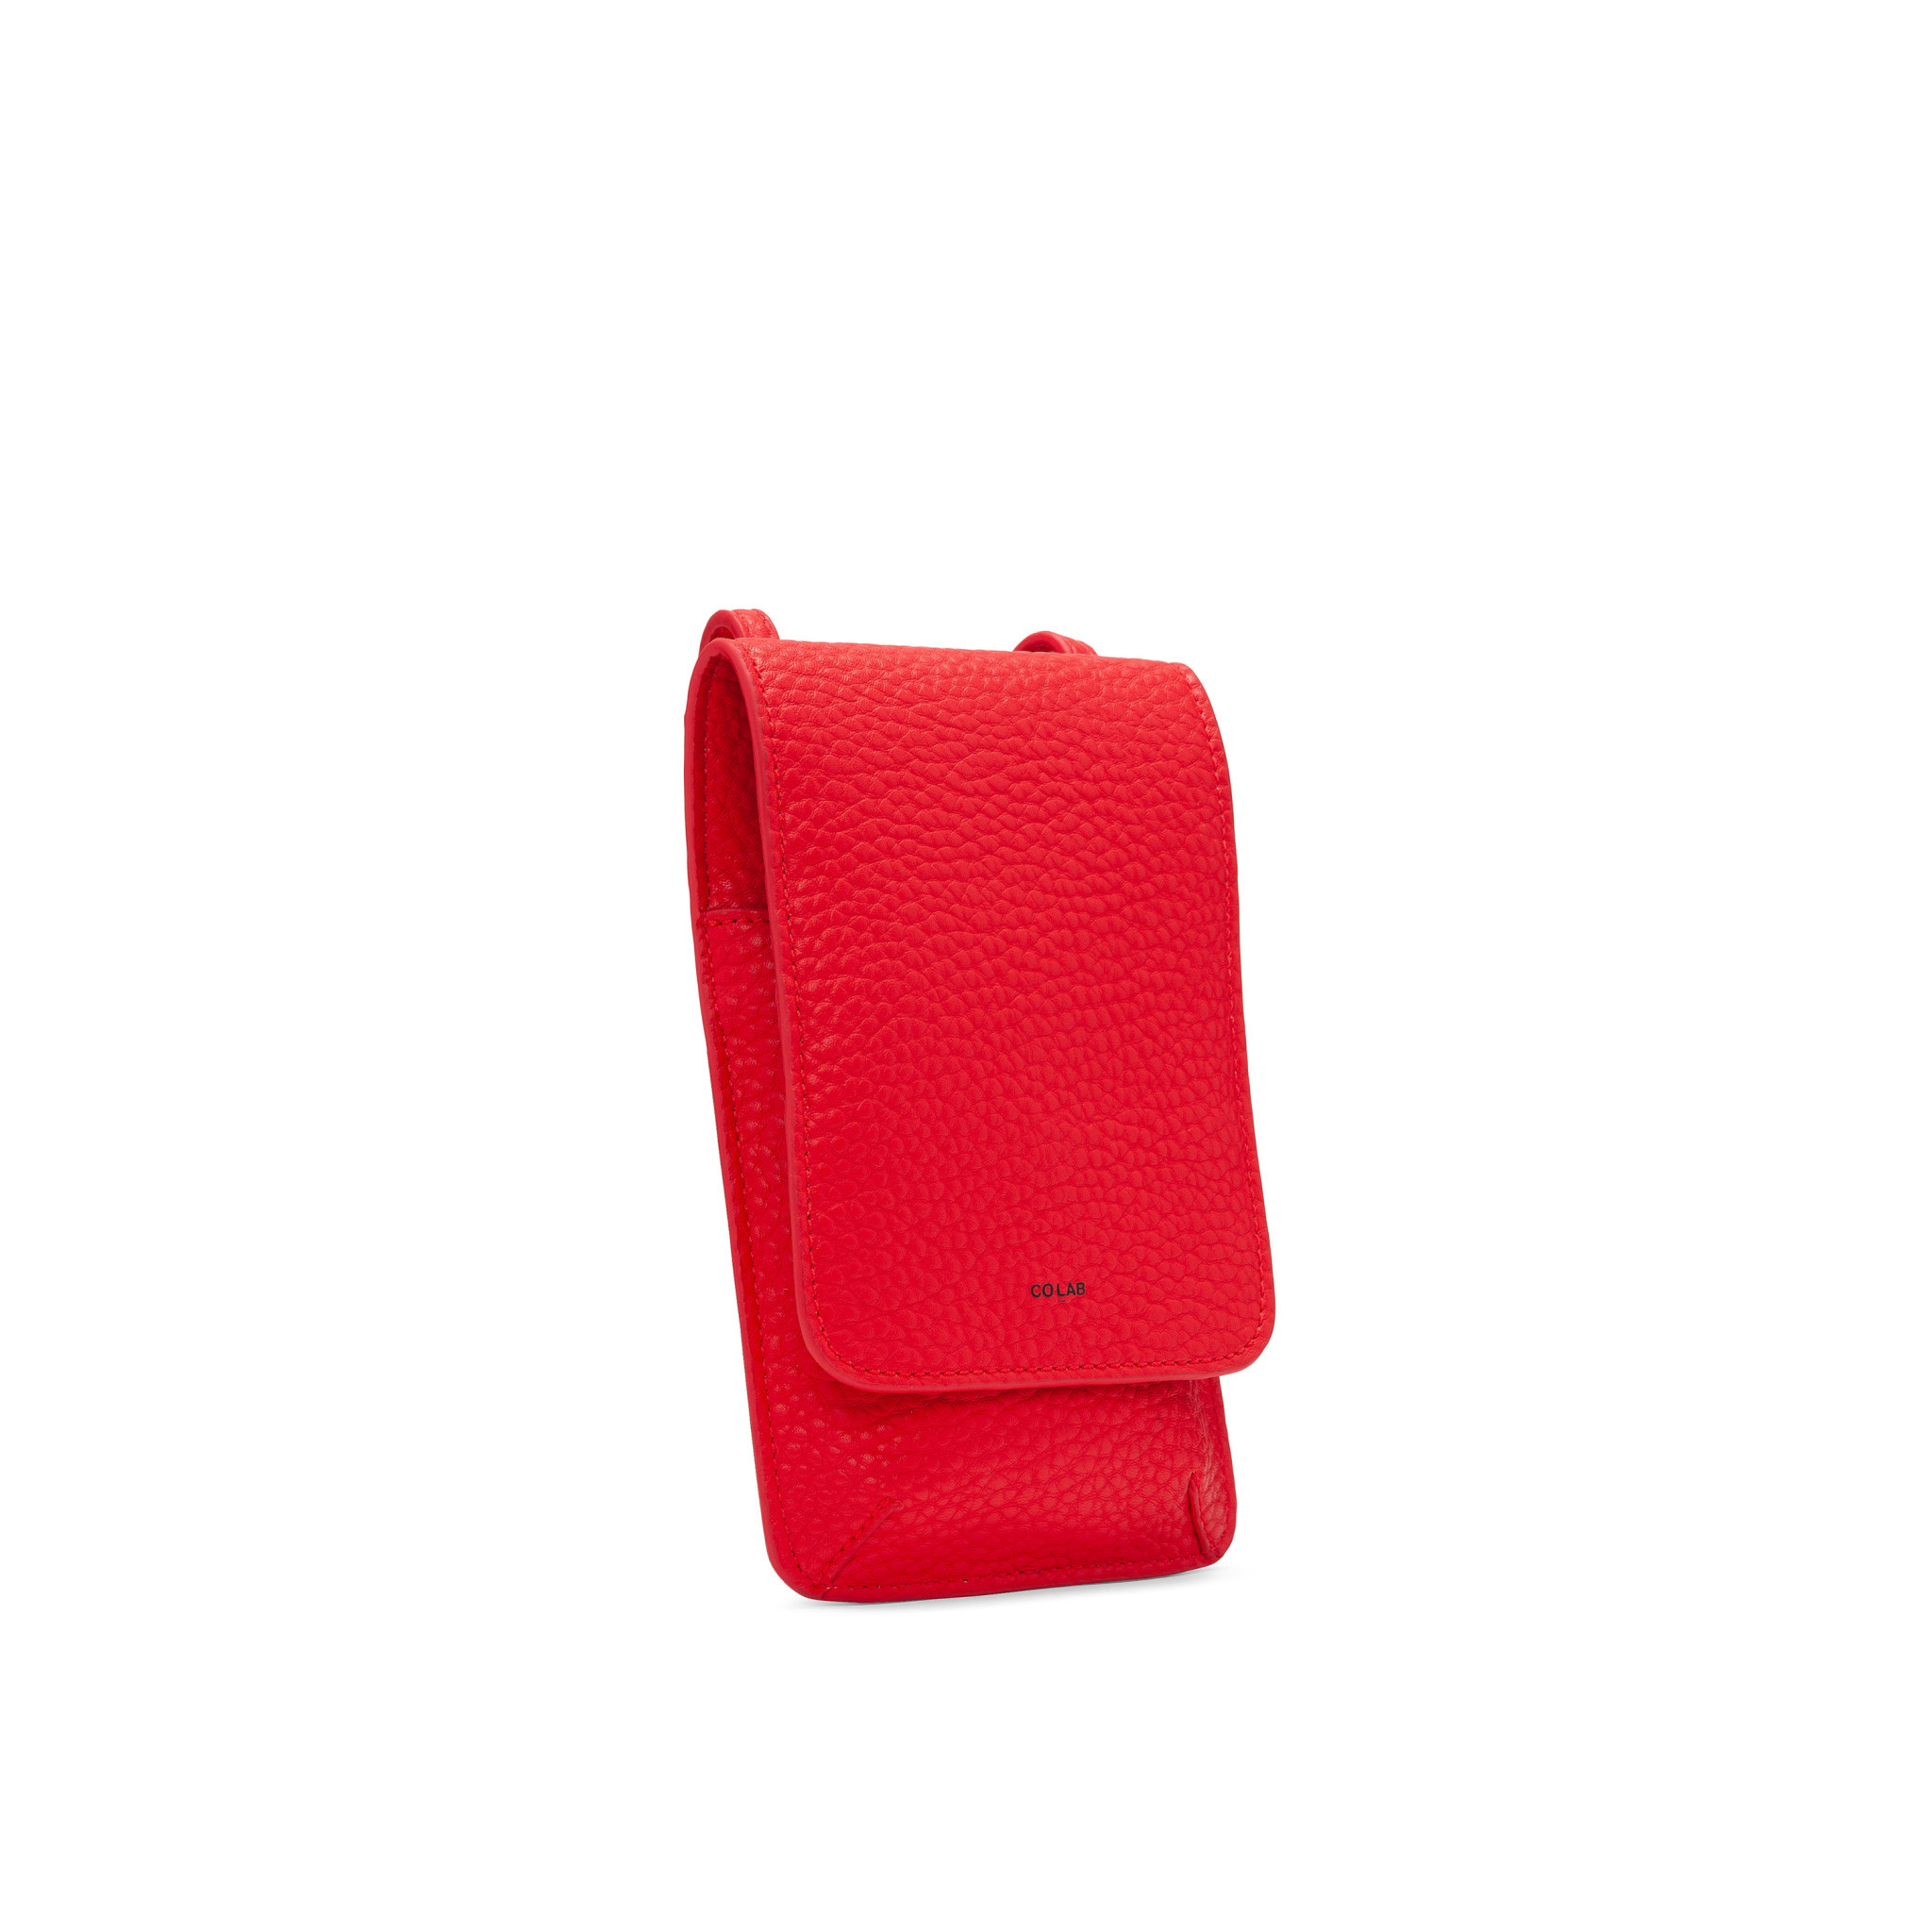 Colab Colab Pebble SLGs Flap Tech Crossbody (#6227) - Candy Apple